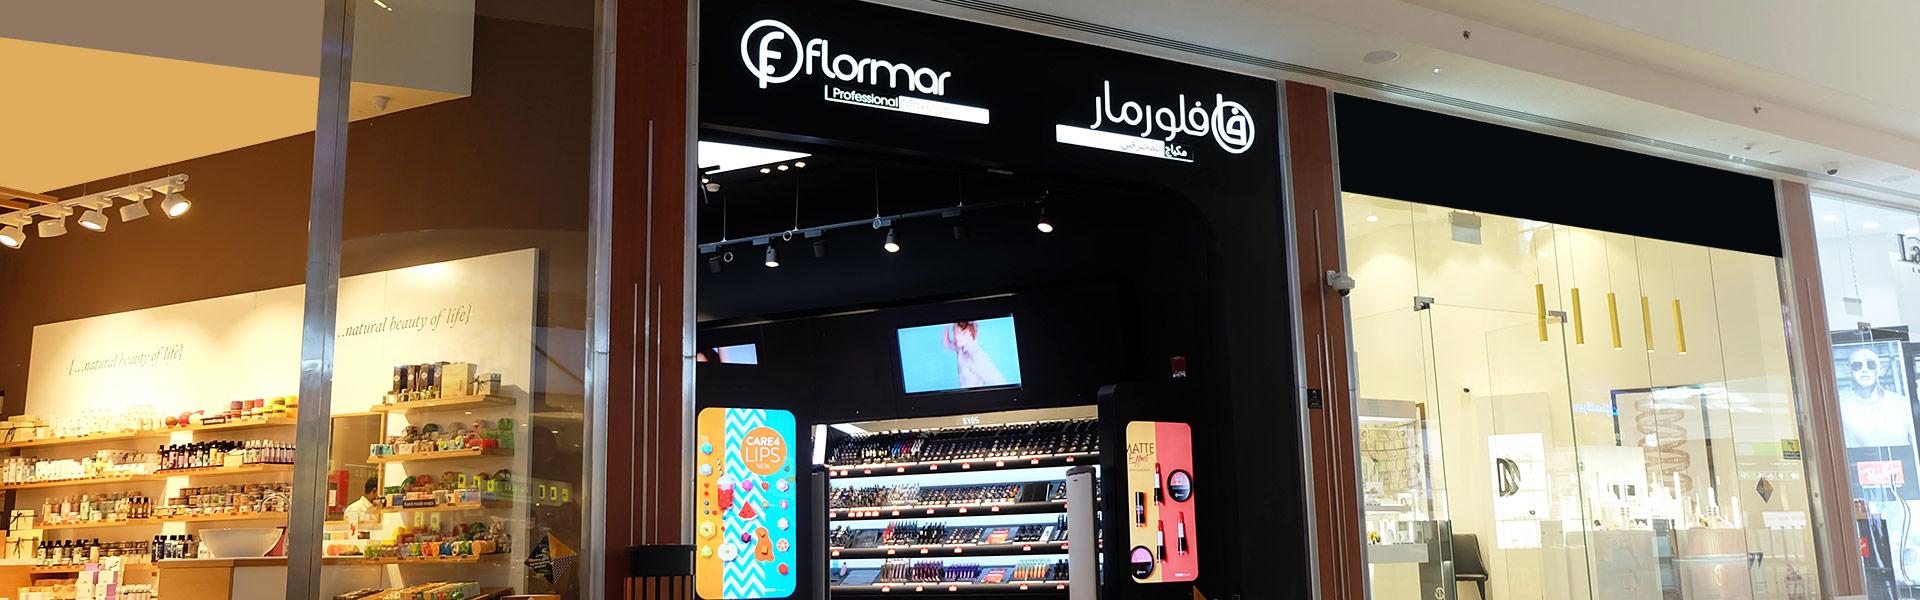 - Flormar_Exterior01.jpg